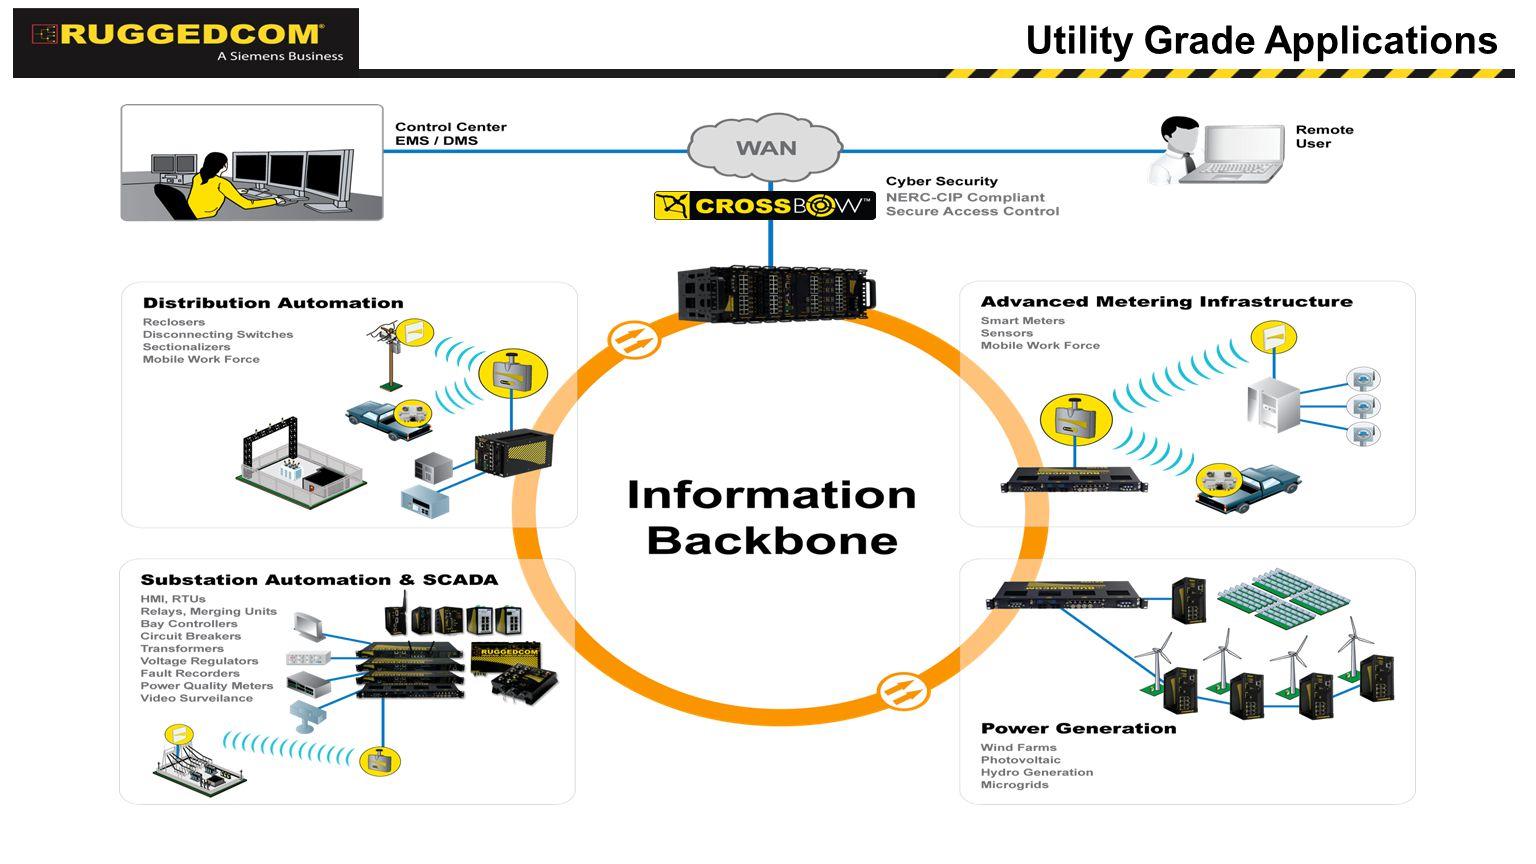 Utility Grade Applications